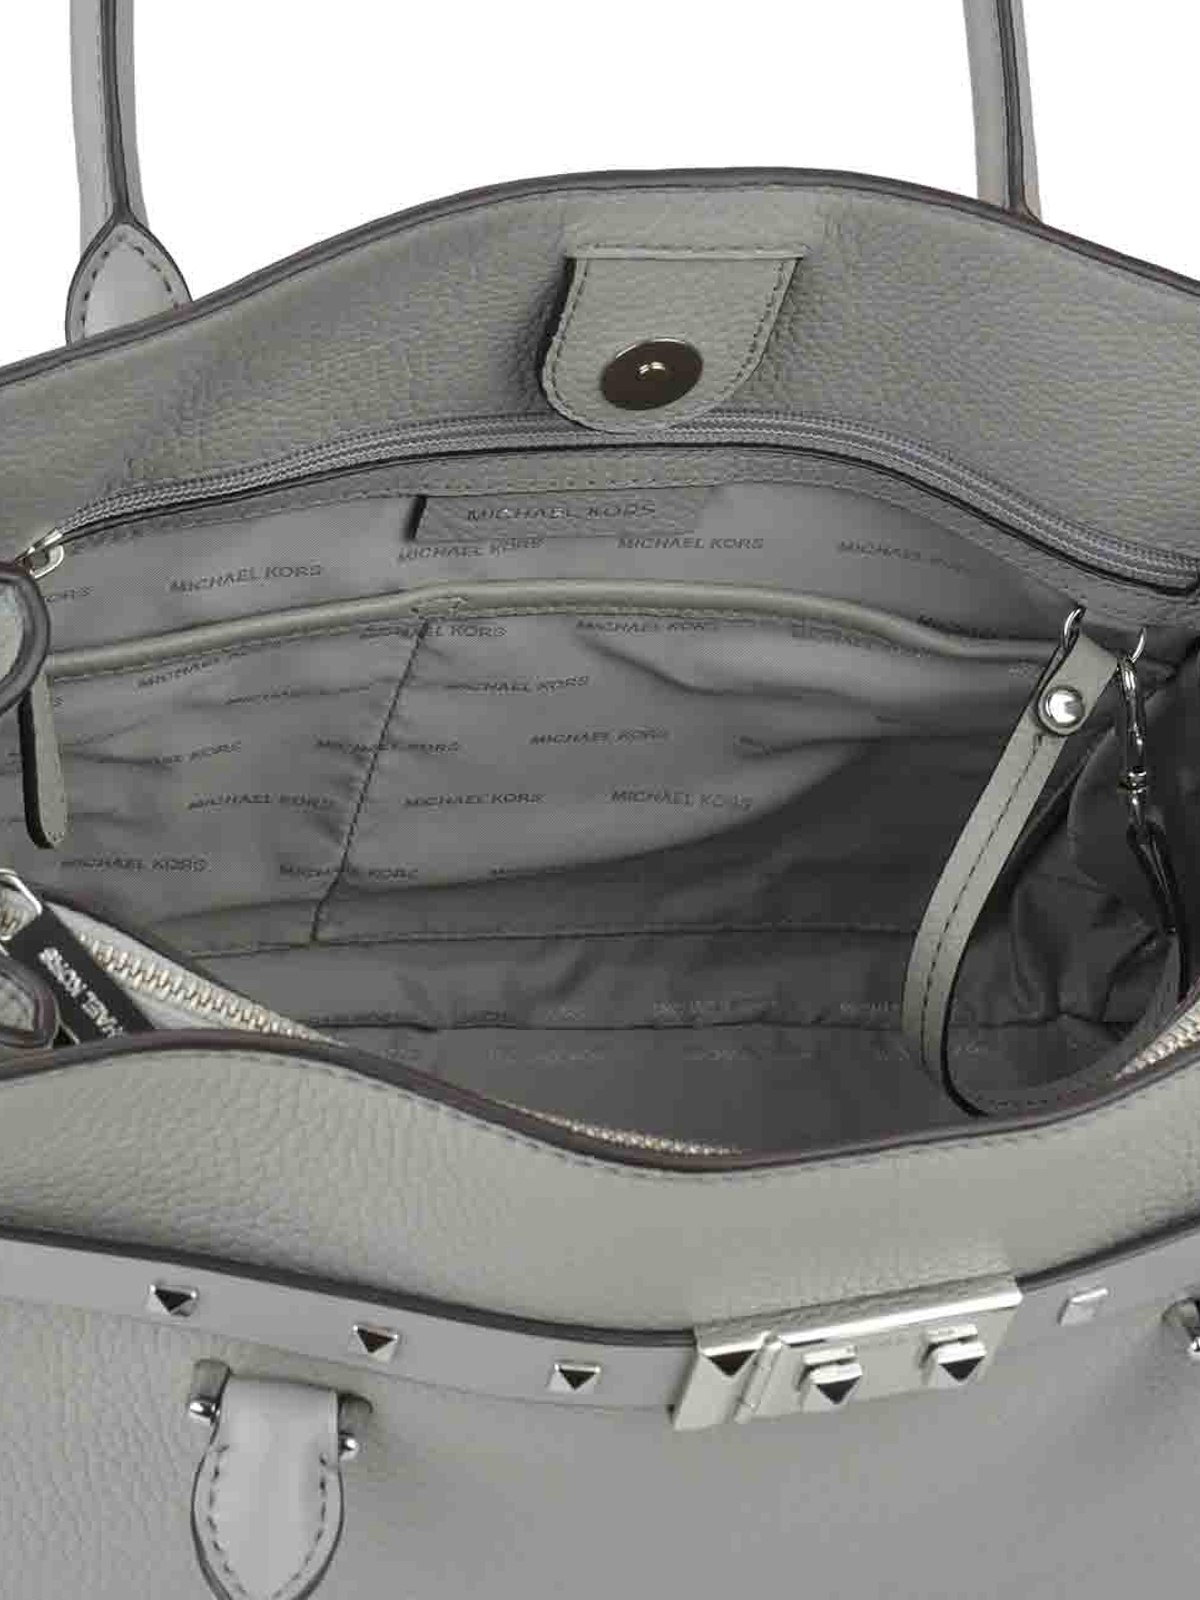 a9338da8b8ed41 Michael Kors - Addison large leather tote - totes bags - 30F8SADT3L 081